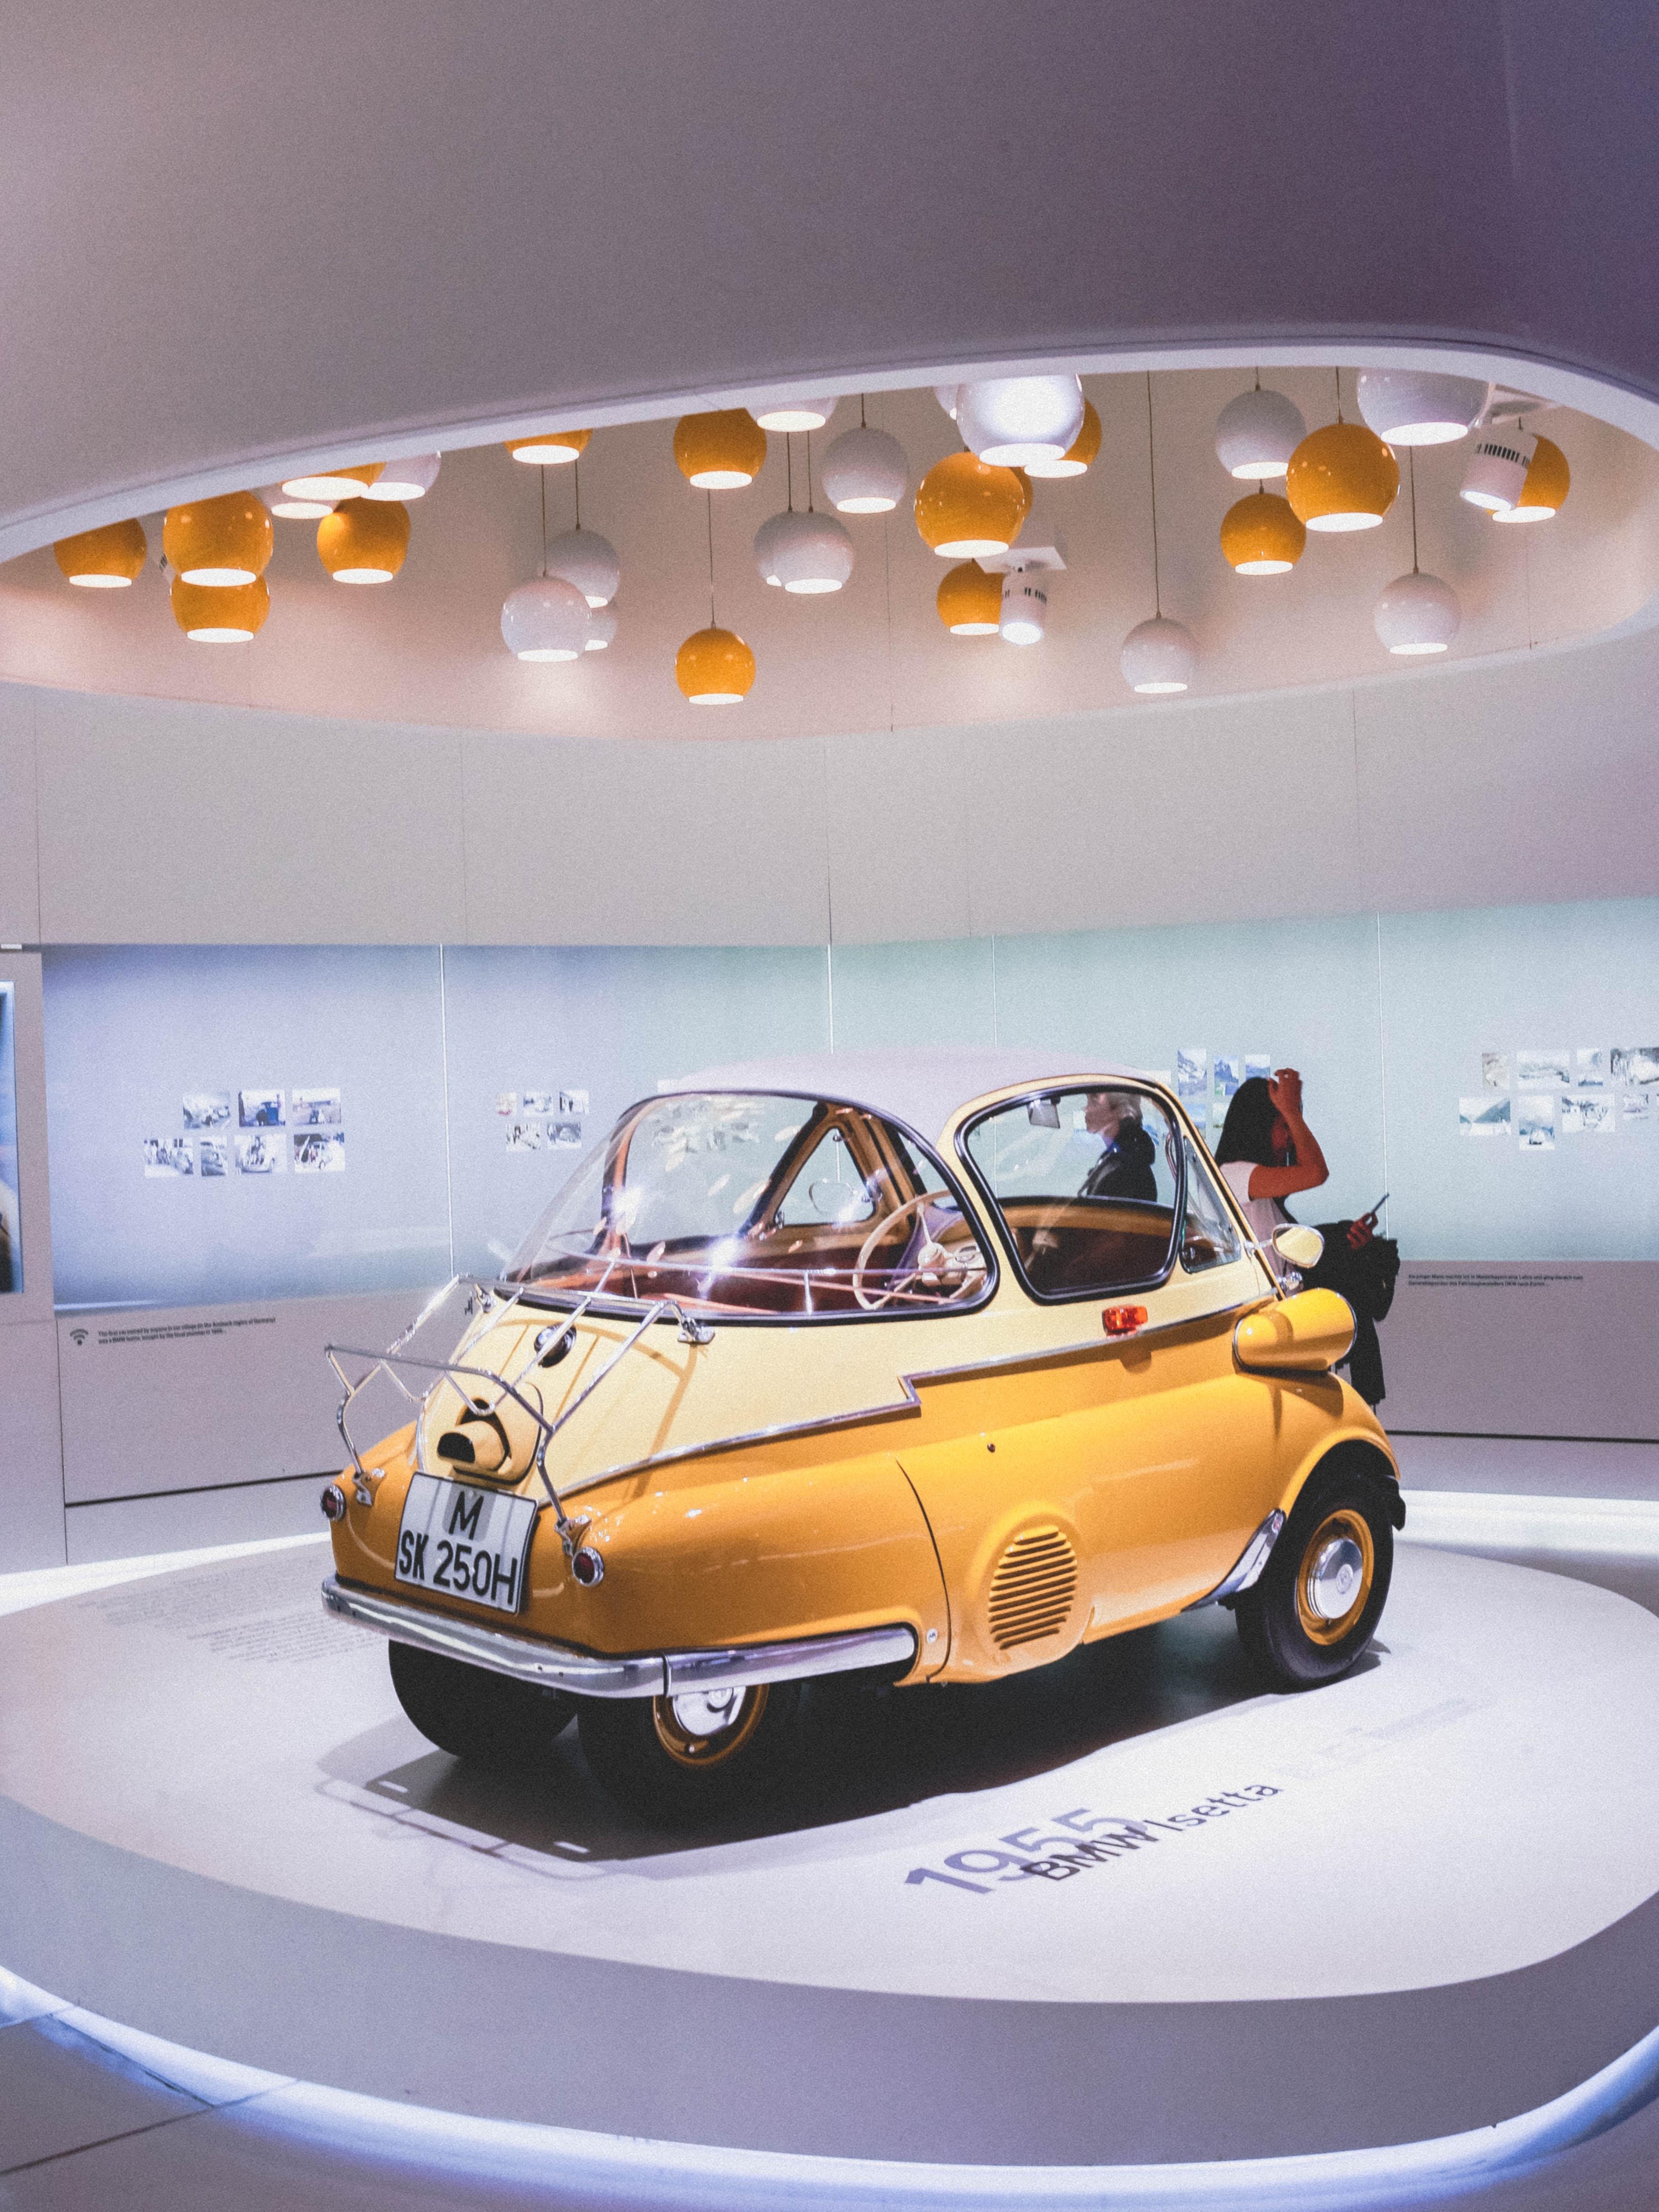 yellow and gray vehicle near wall